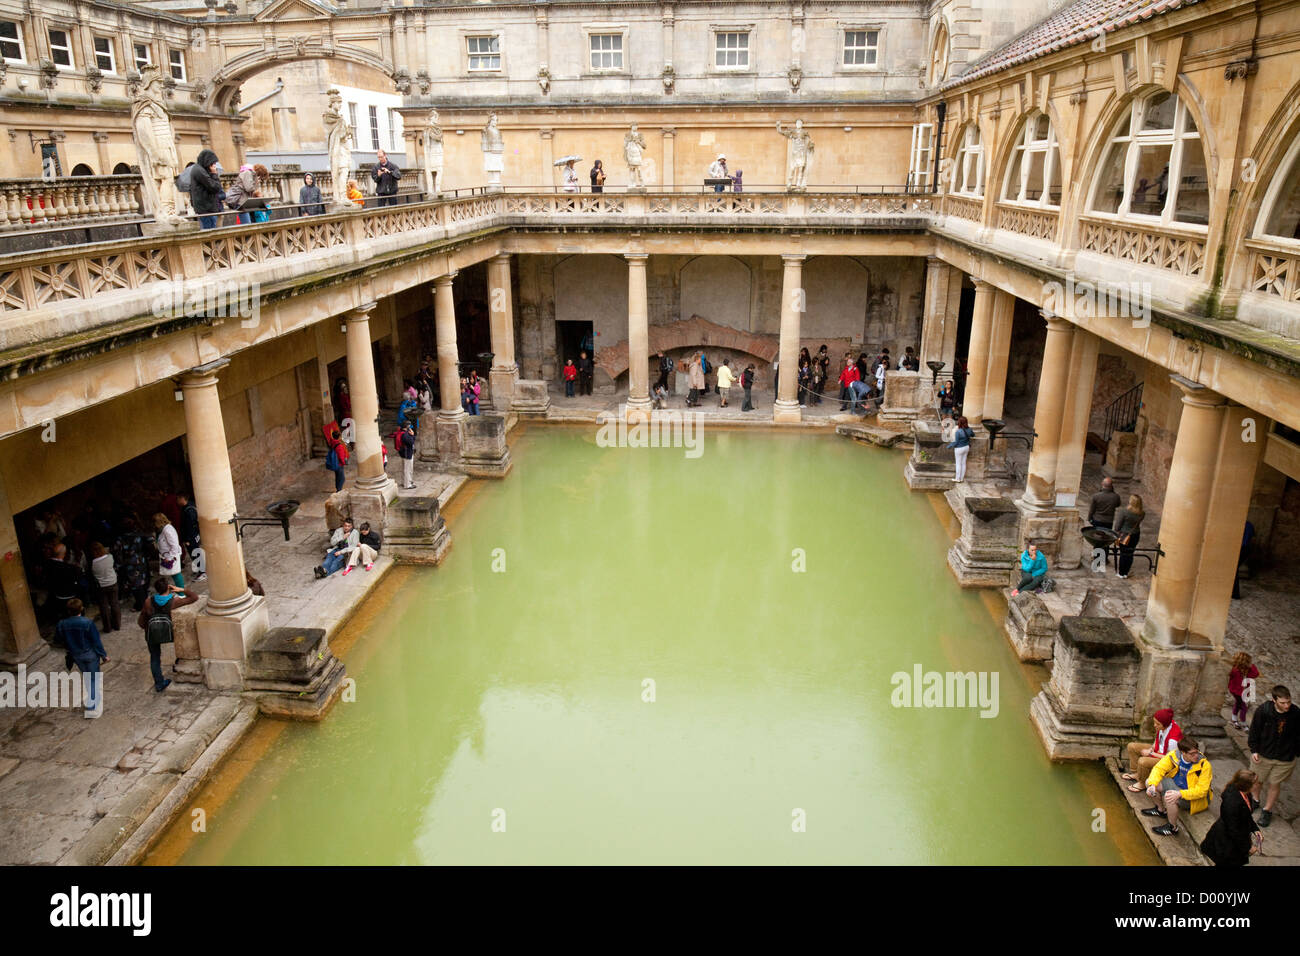 Roman baths, Bath Somerset 4th century UNESCO World heritage site England UK - Stock Image